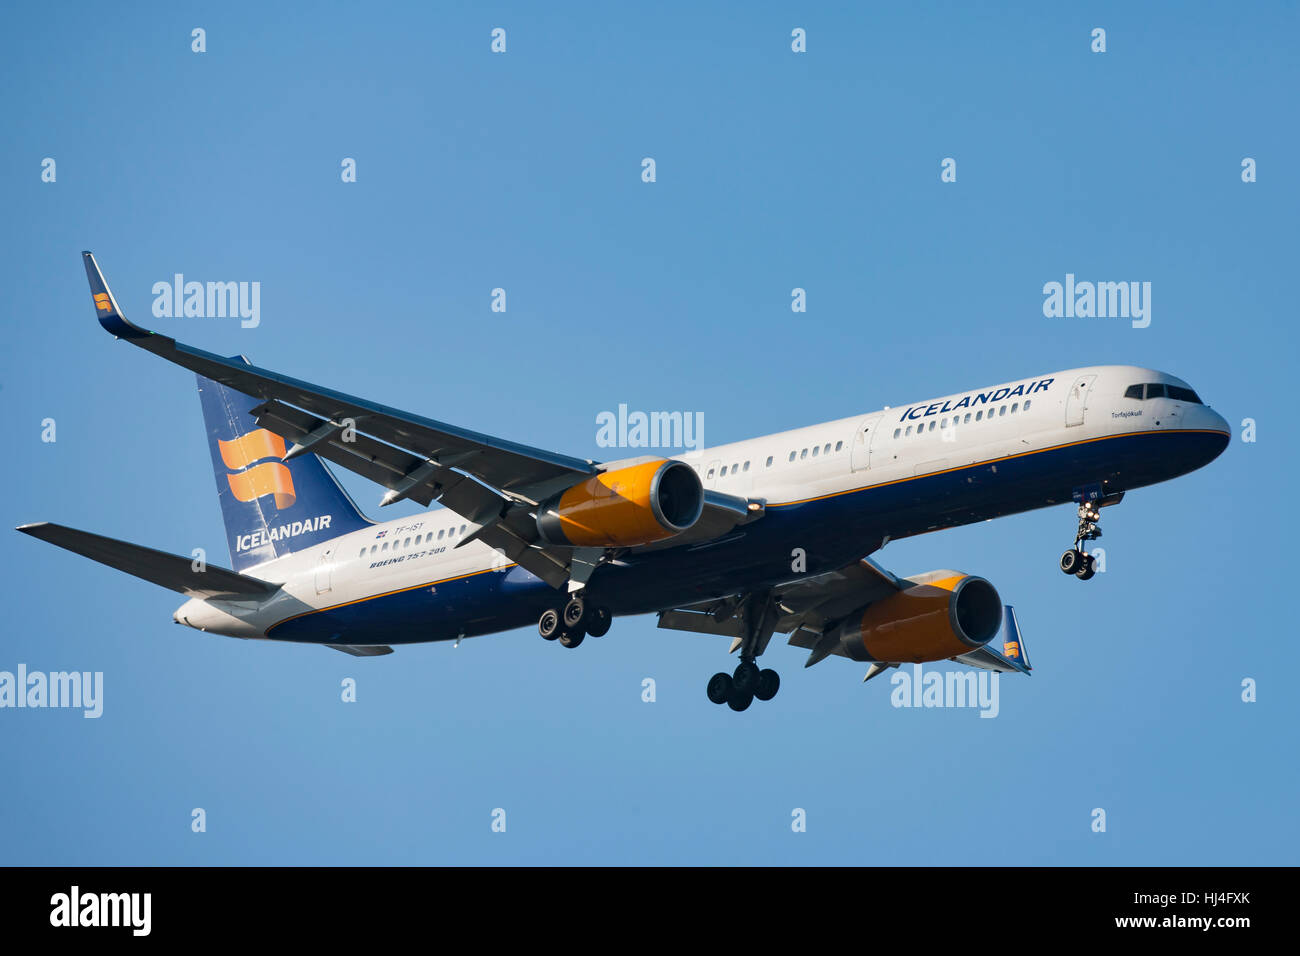 Icelandair Airliner in flight, airplane, plane, blue sky - Stock Image